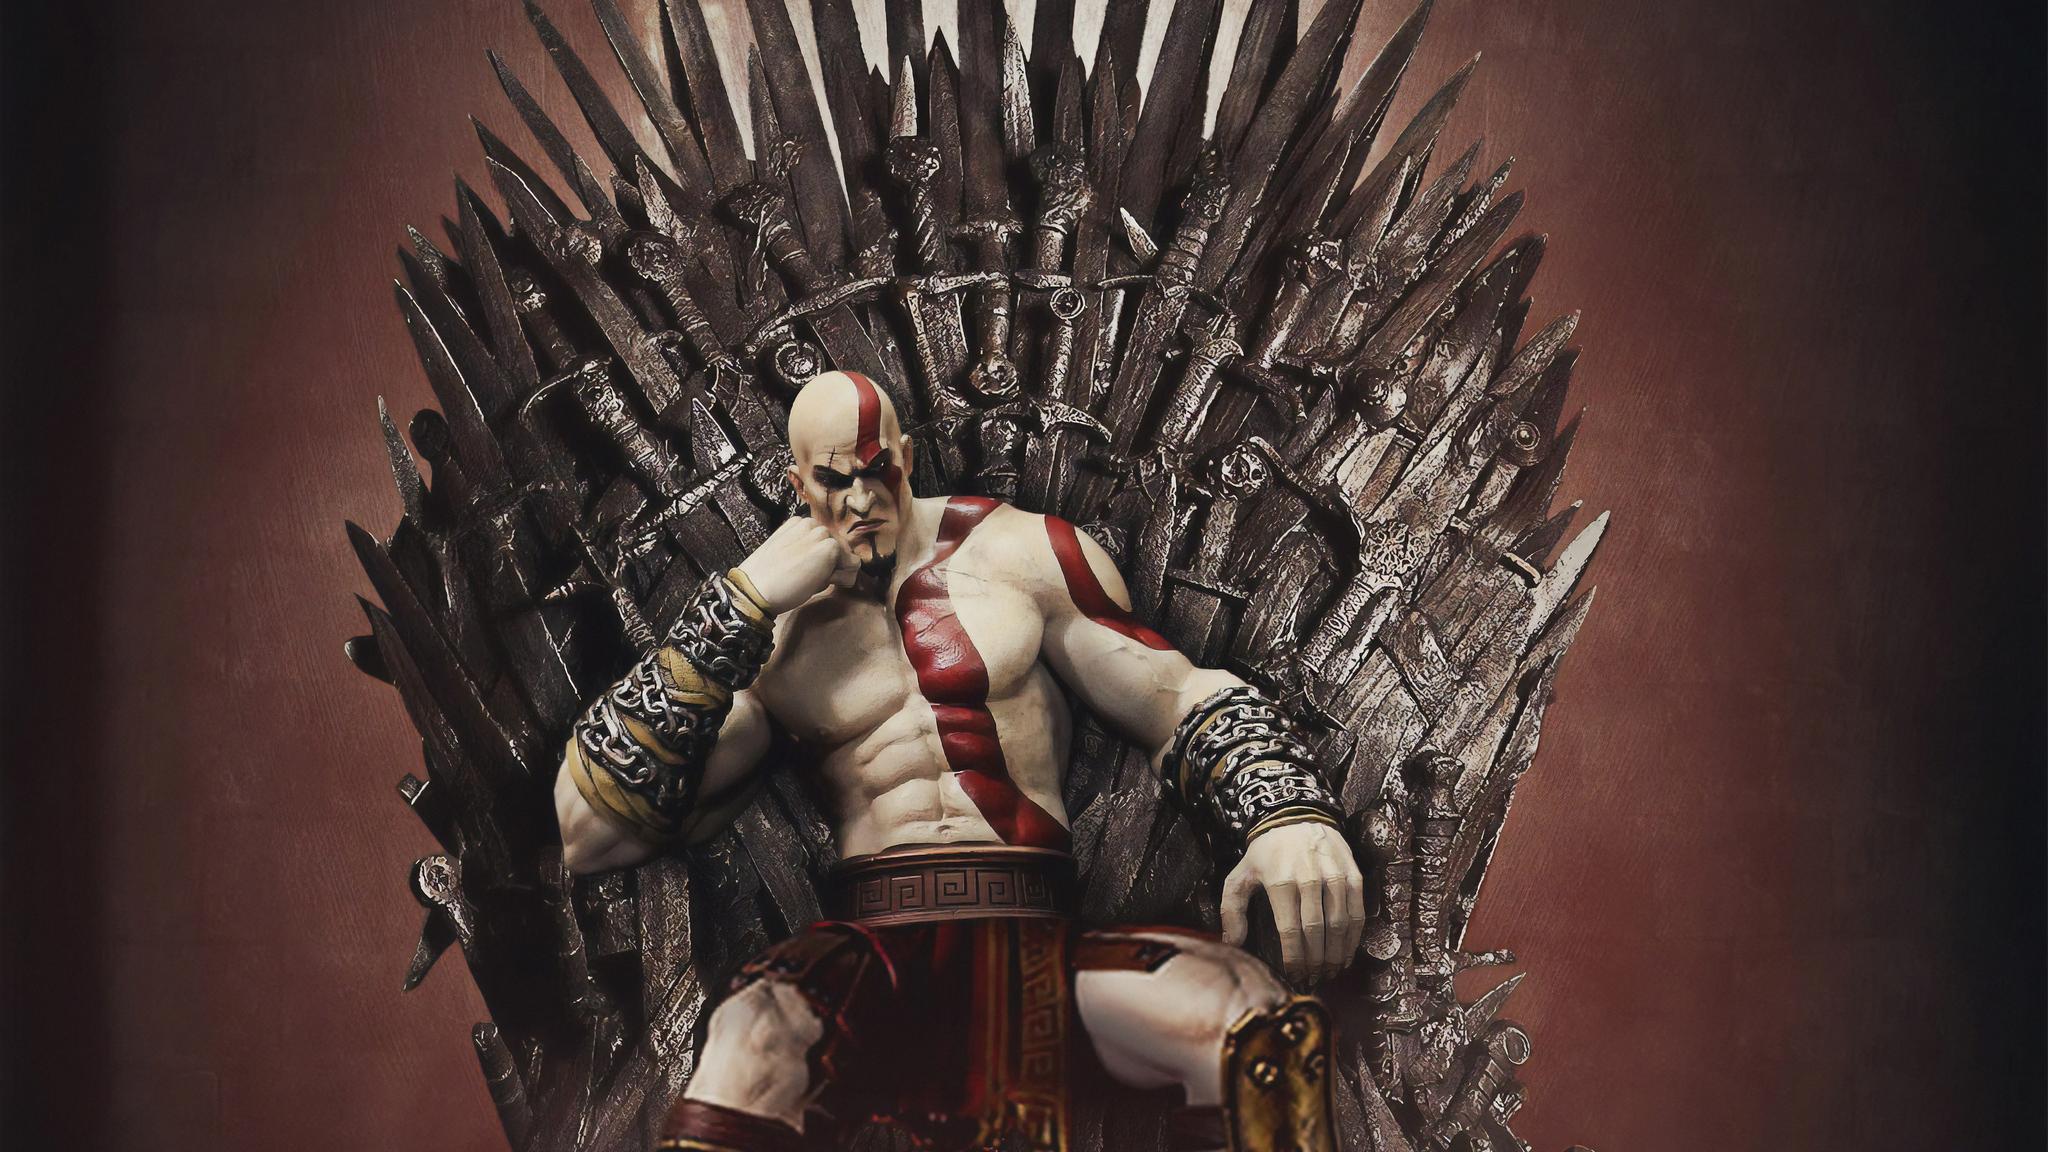 kratos-on-thrones-6p.jpg